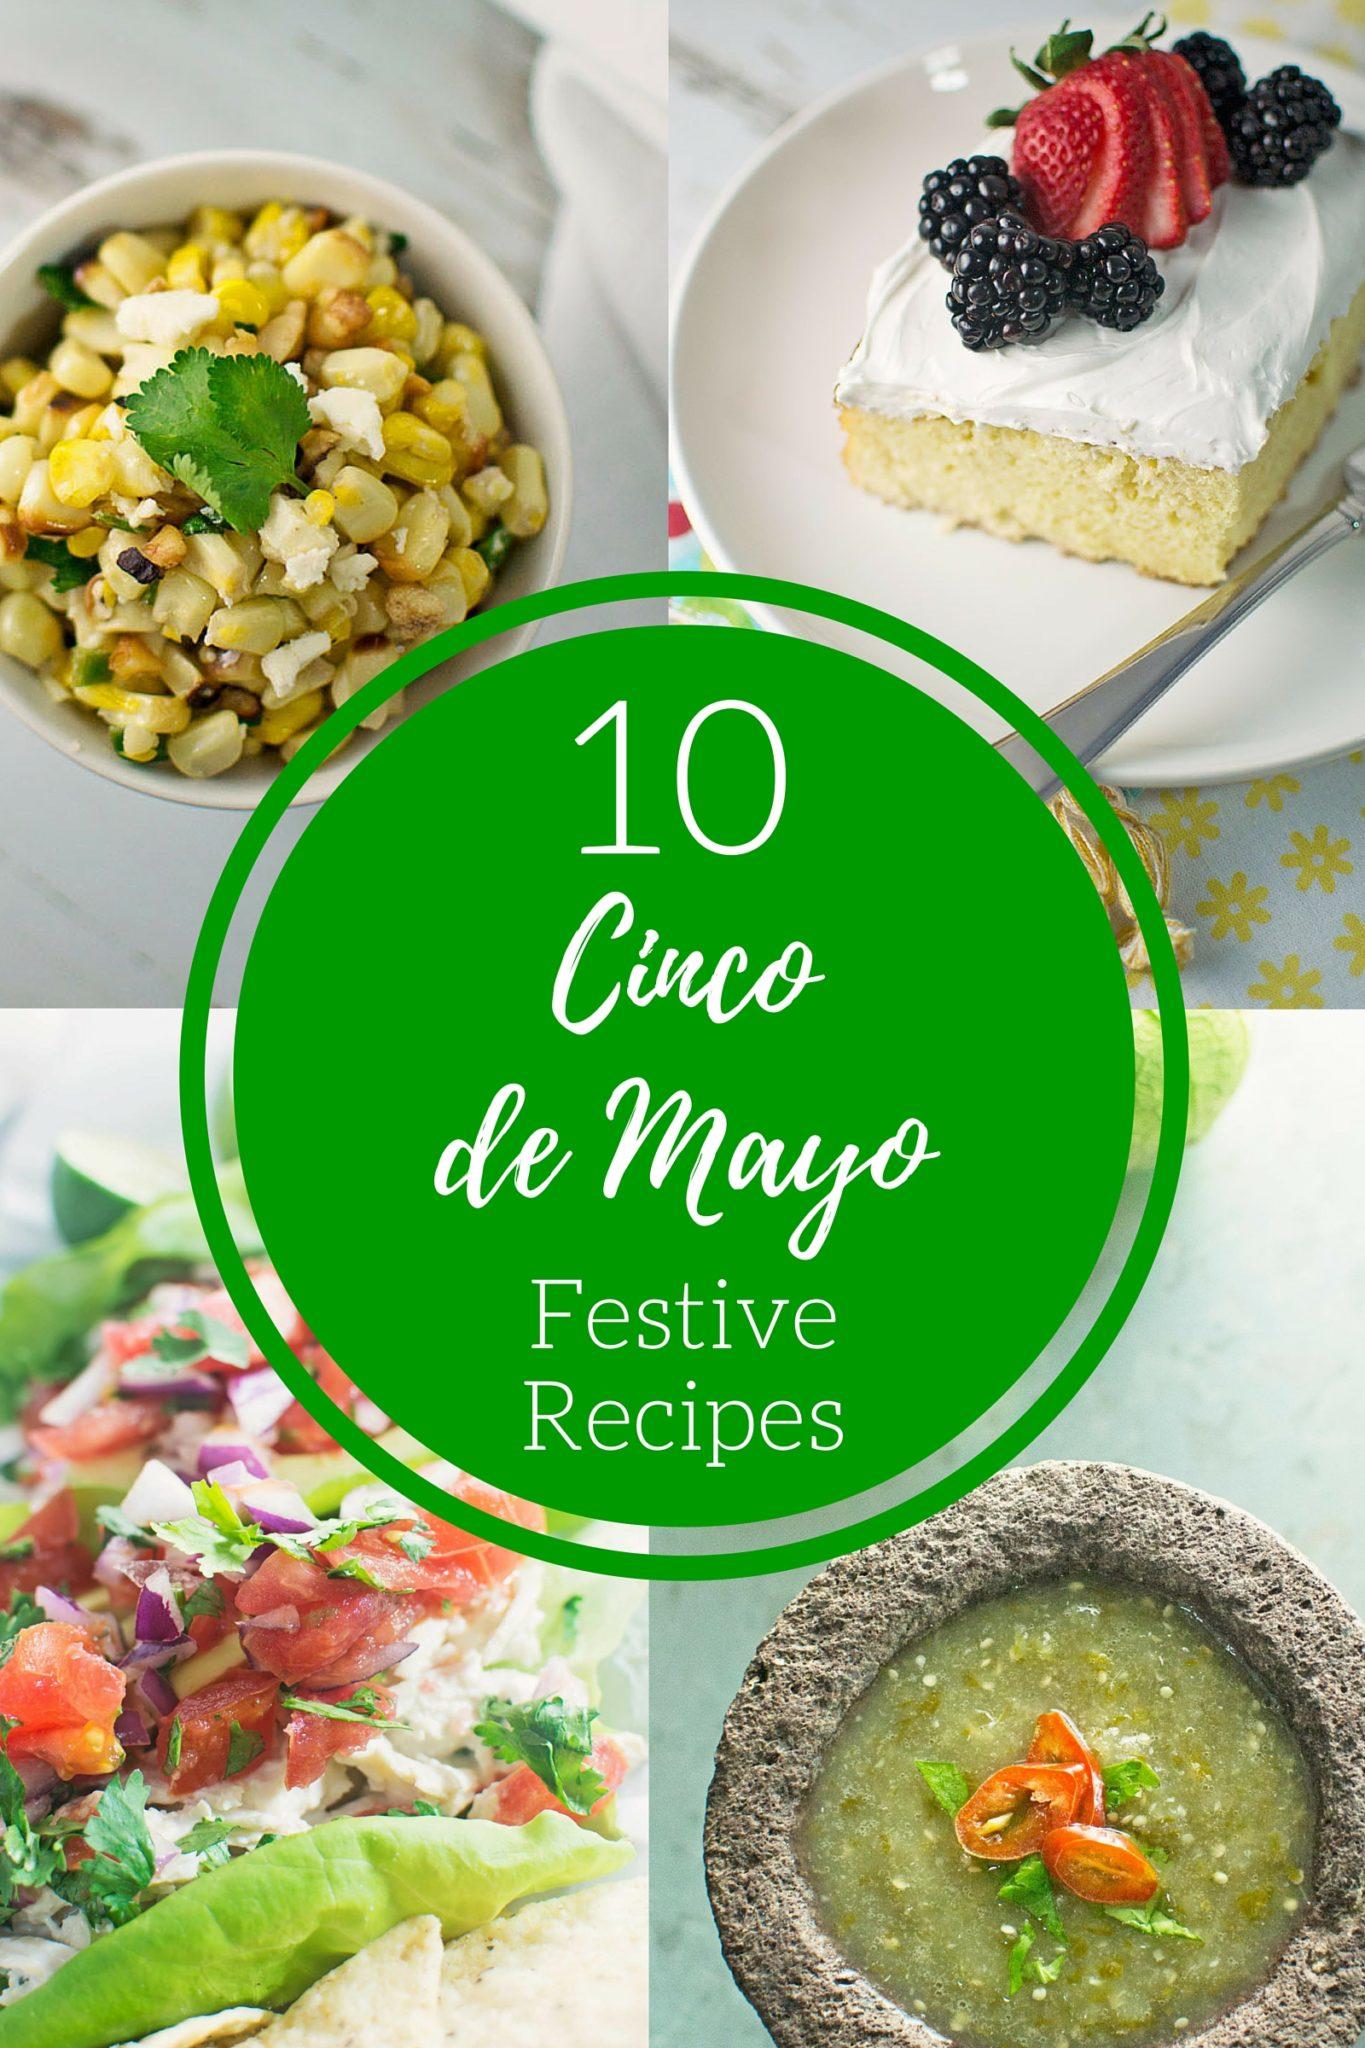 10 Cinco de Mayo Festive Recipes that will keep that are fiesta worthy! #Recipes found @LittleFiggyFood